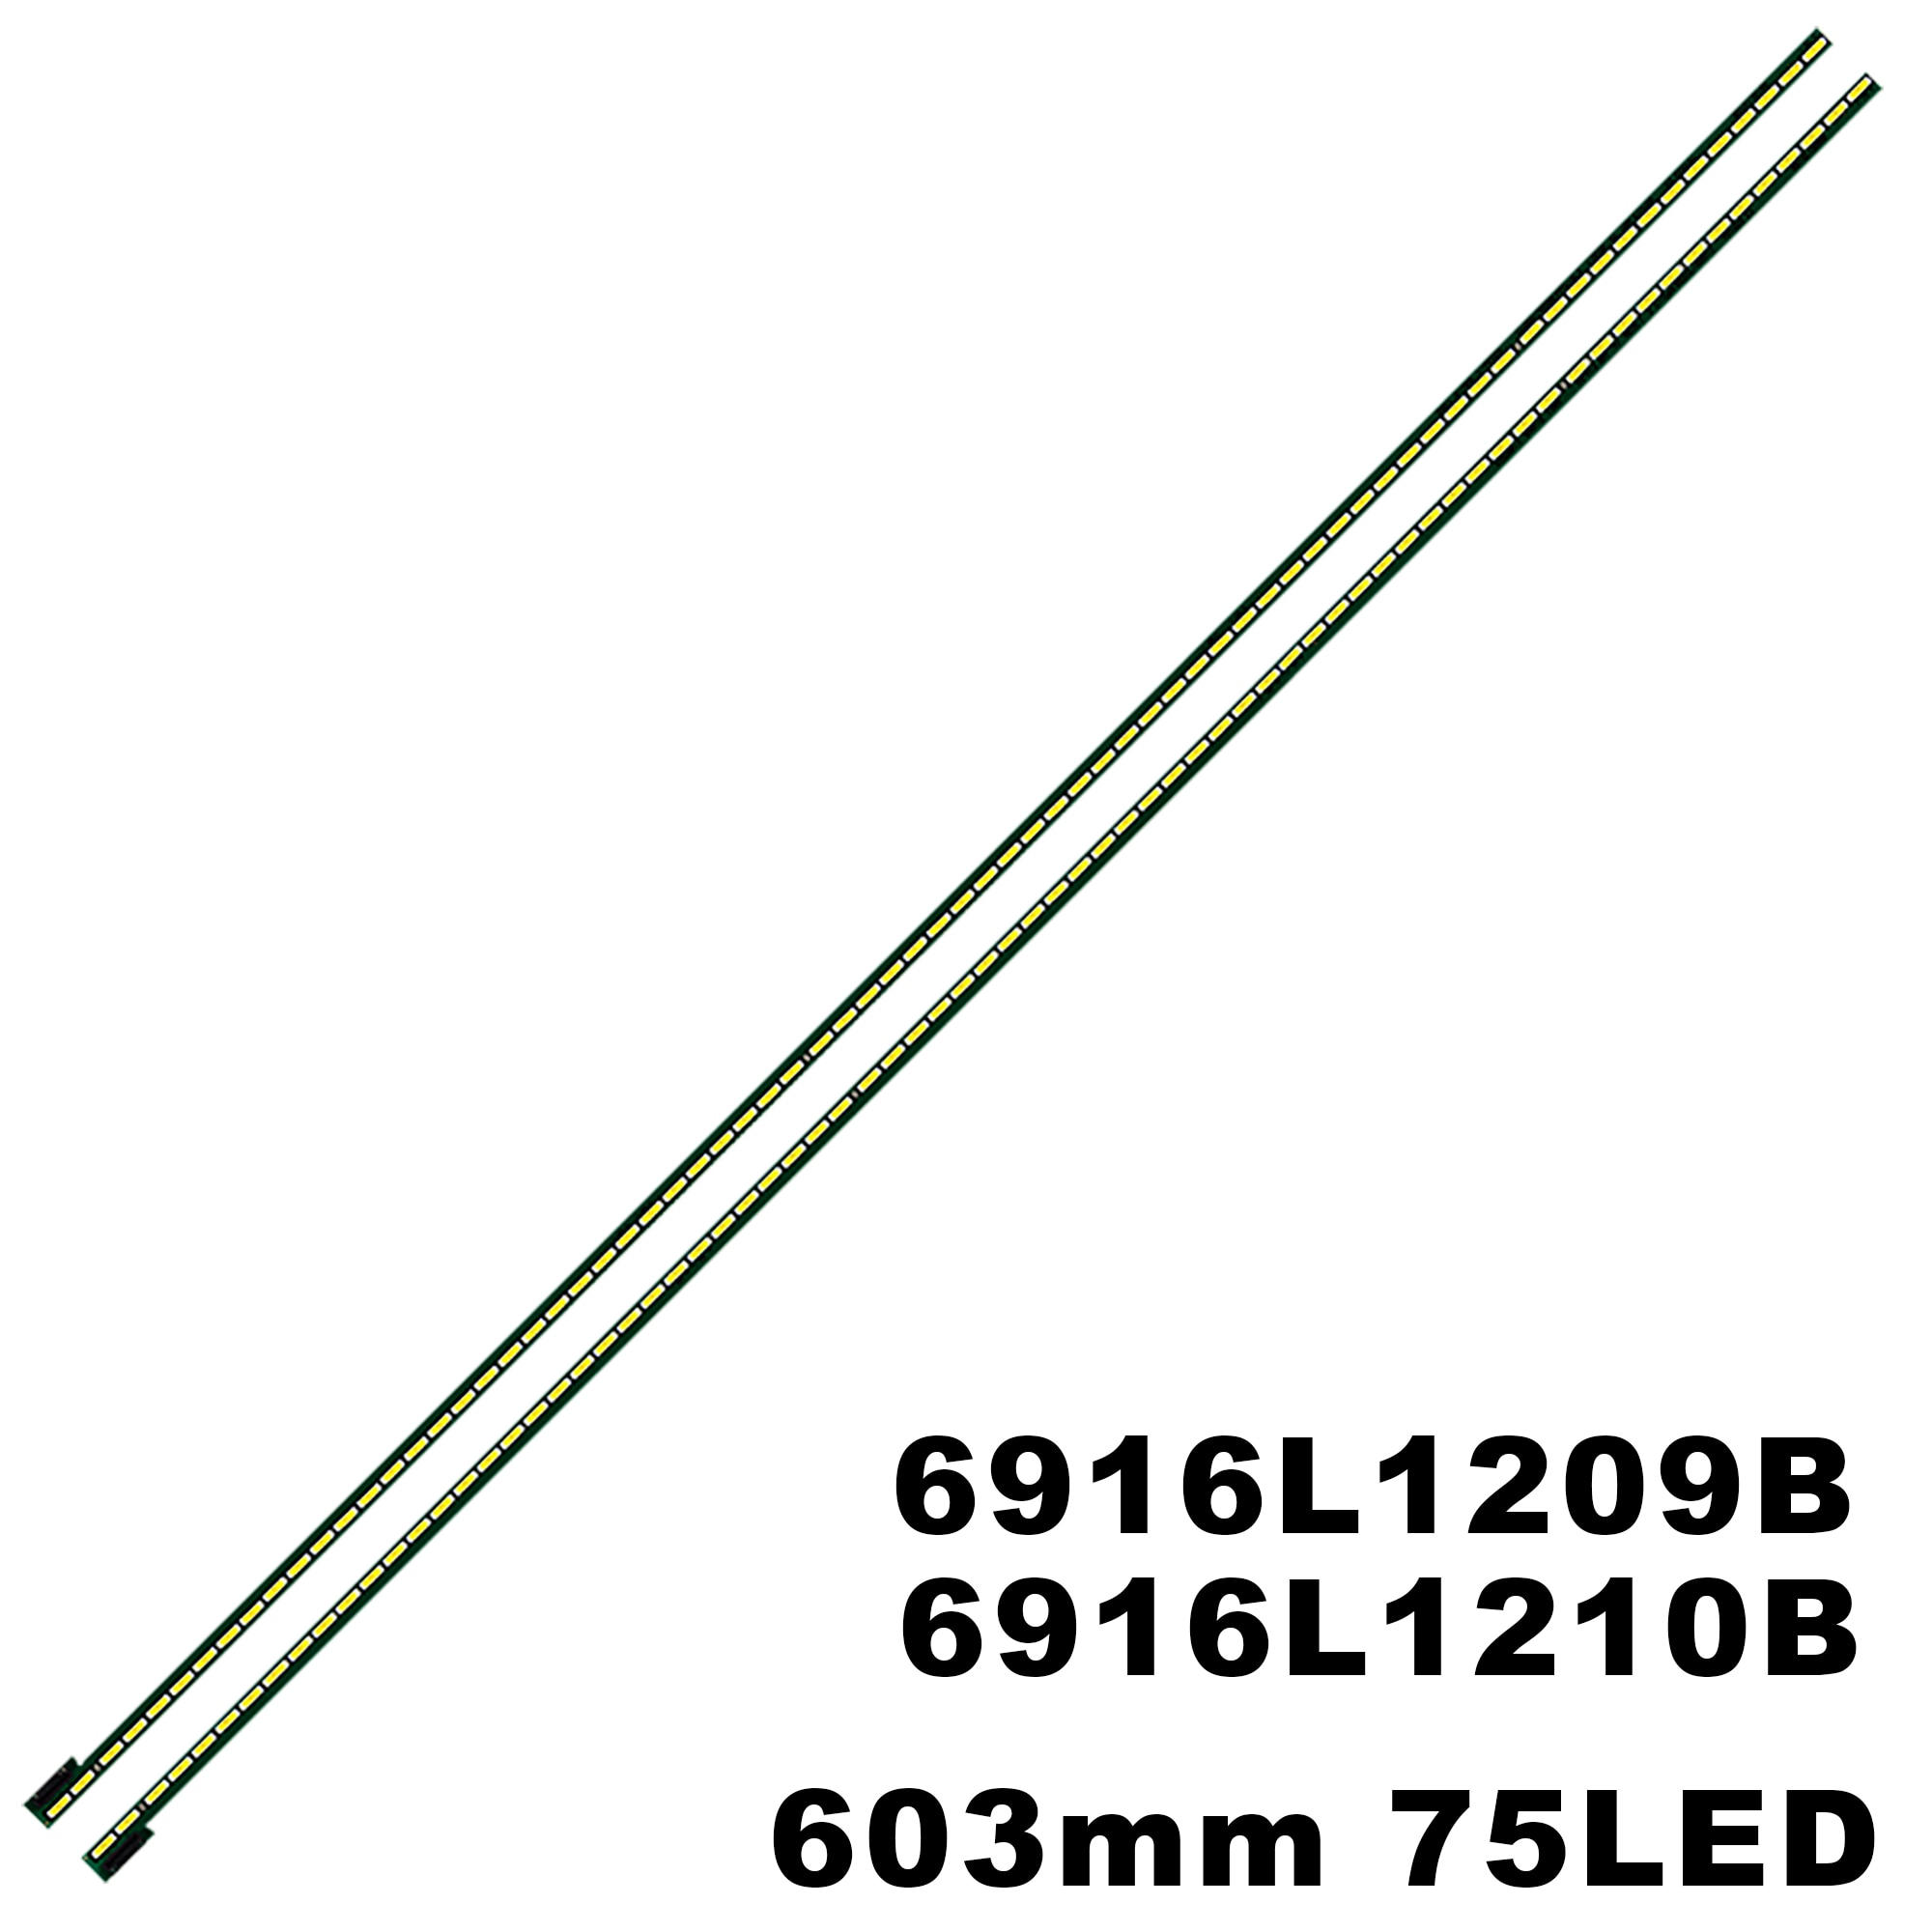 جديد 10 قطعة 75LED 605 مللي متر LED قطاع ل 55PFL6008K 55LA691V 55LA6800 6922L-0069A 55 V13 الفن التلفزيون rl 6920L-0001C